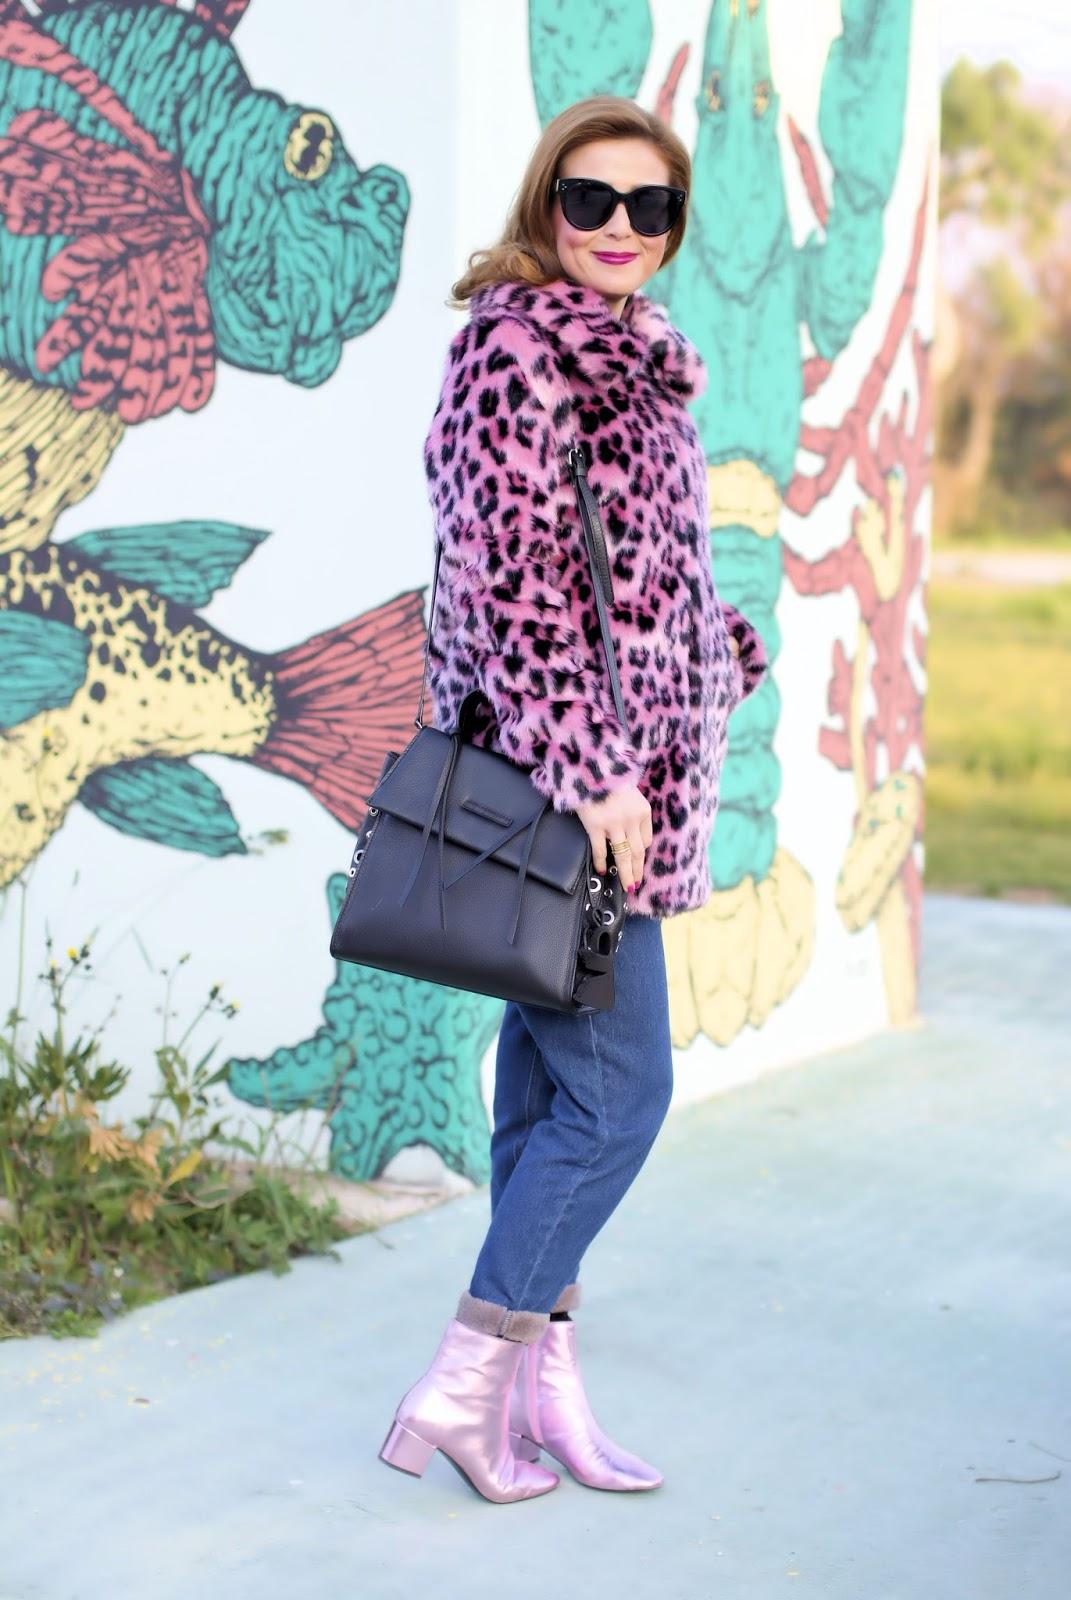 Giacca leopardo rosa su Fashion and Cookies fashion blog, fashion blogger style